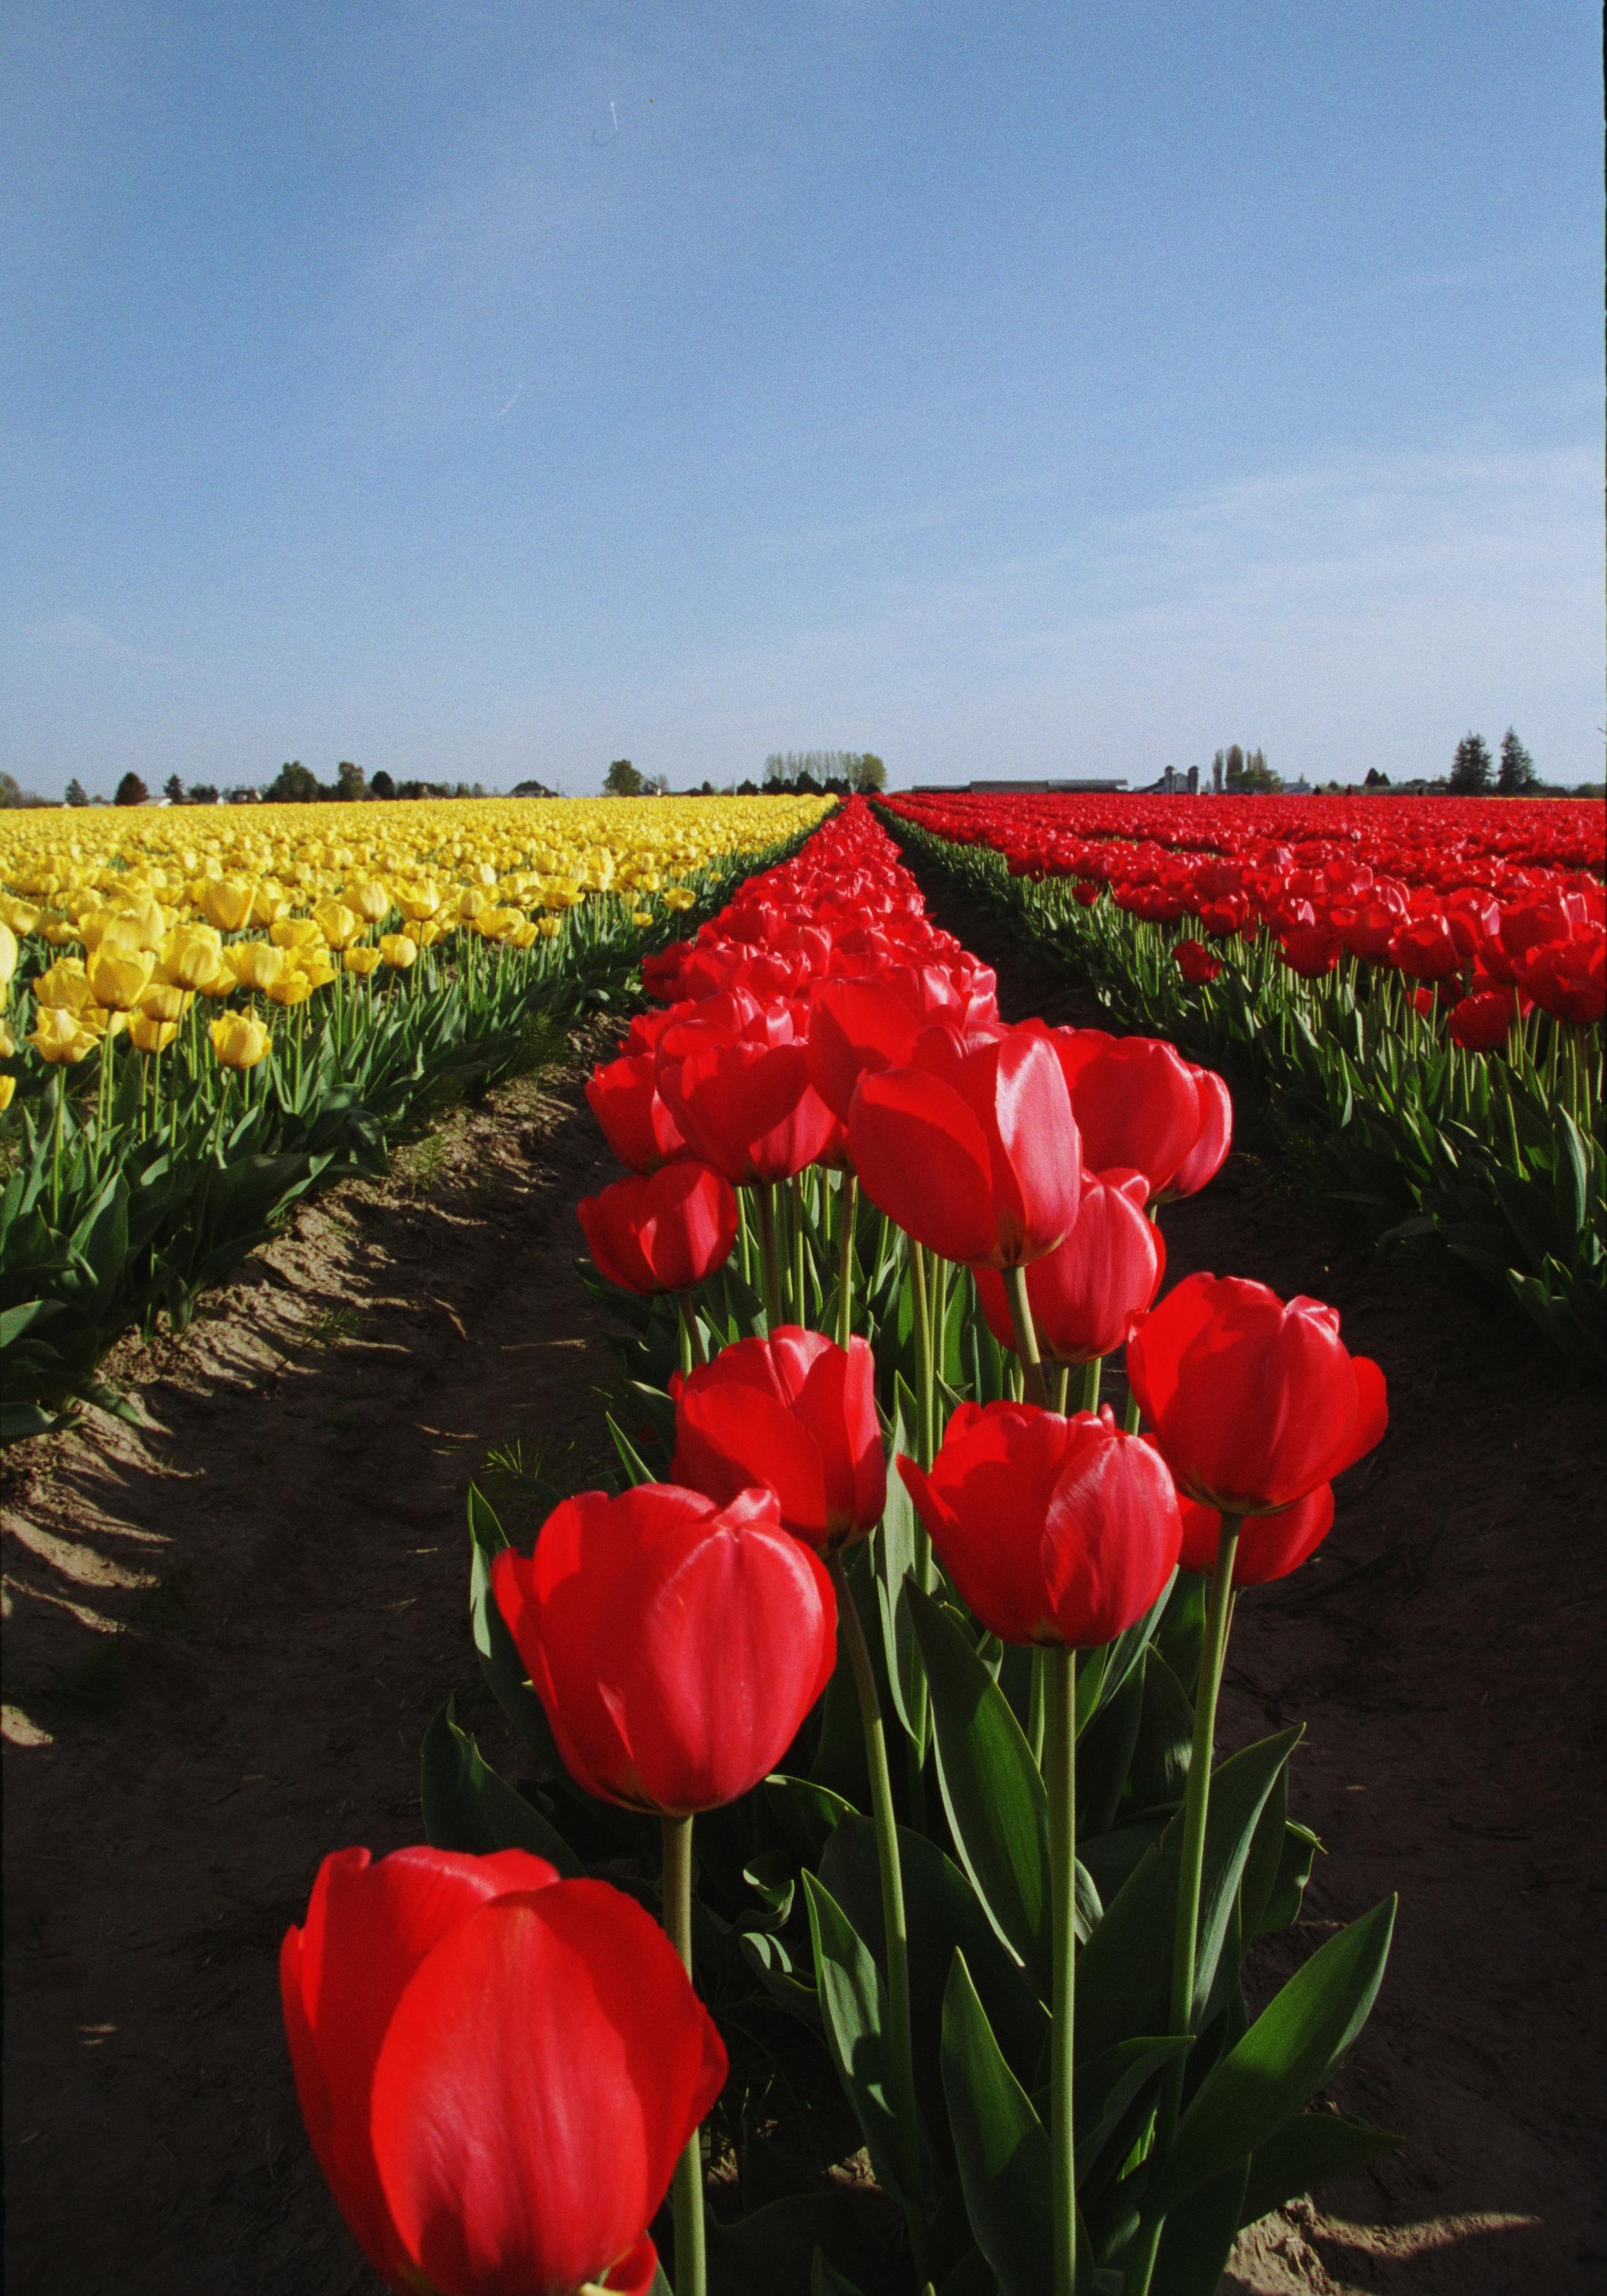 Tulips to Infinity - Skagit Valley Tulip Festival, WA